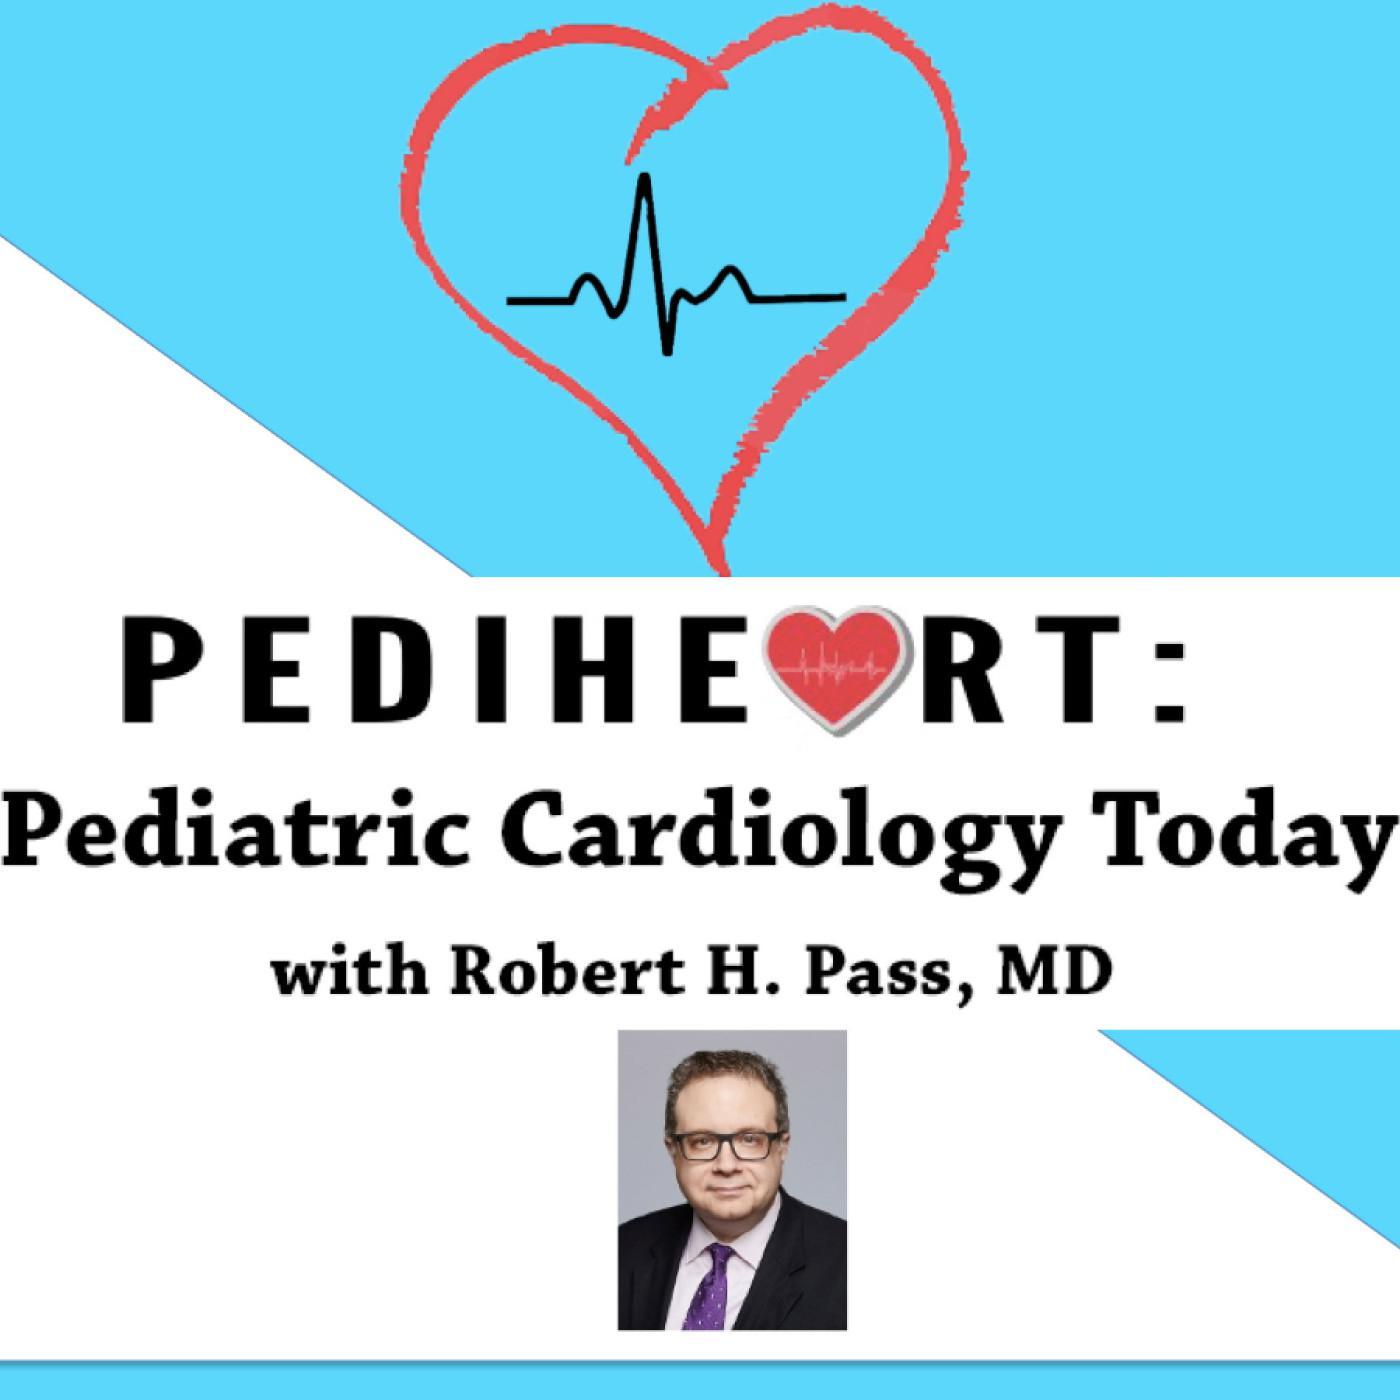 Pediheart: Pediatric Cardiology Today (podcast) - Robert Pass